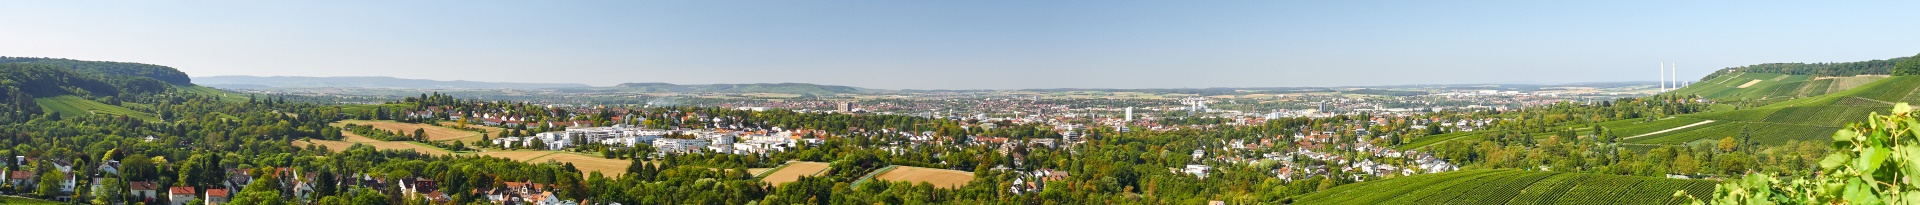 Heilbronn-Franconia